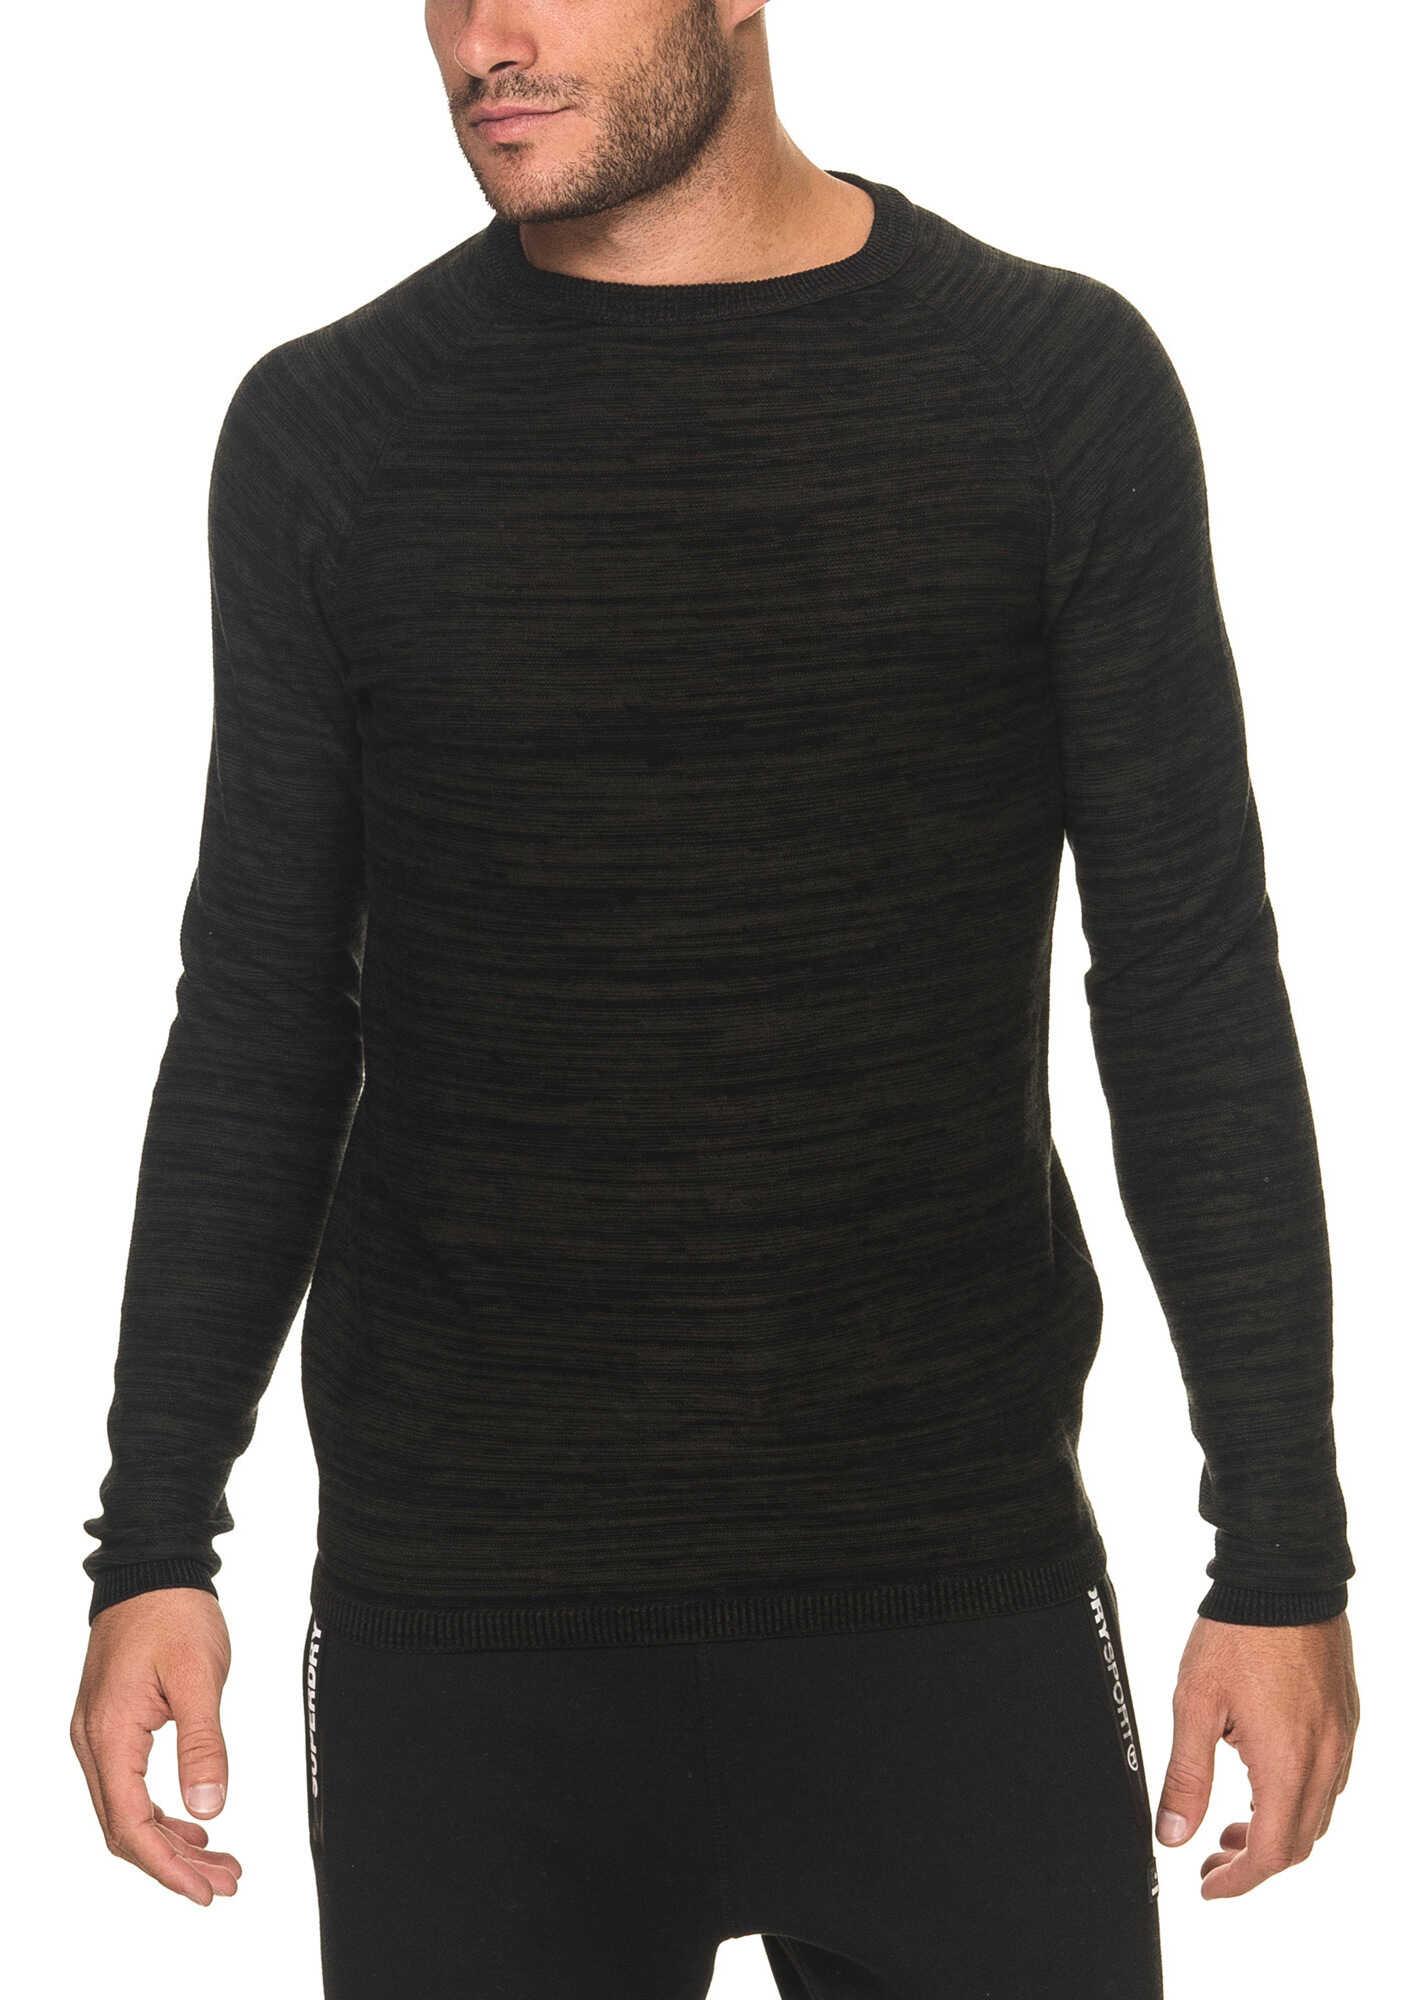 JACK & JONES Smash Mens Black Melange Sweater Rosin